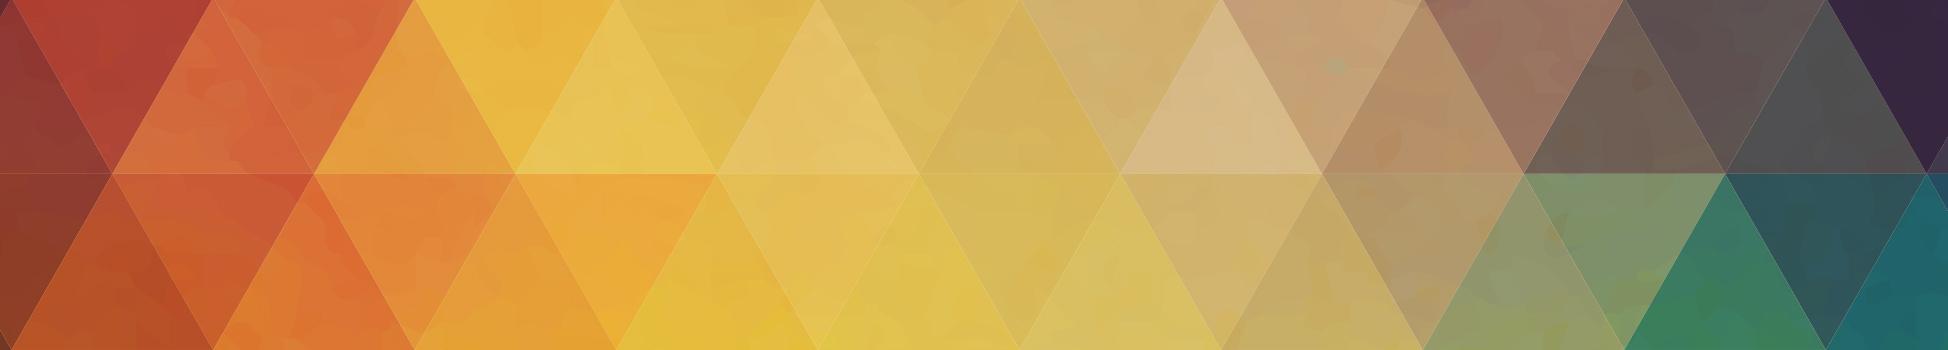 bn-homepage-conceitos-frase-2-01B